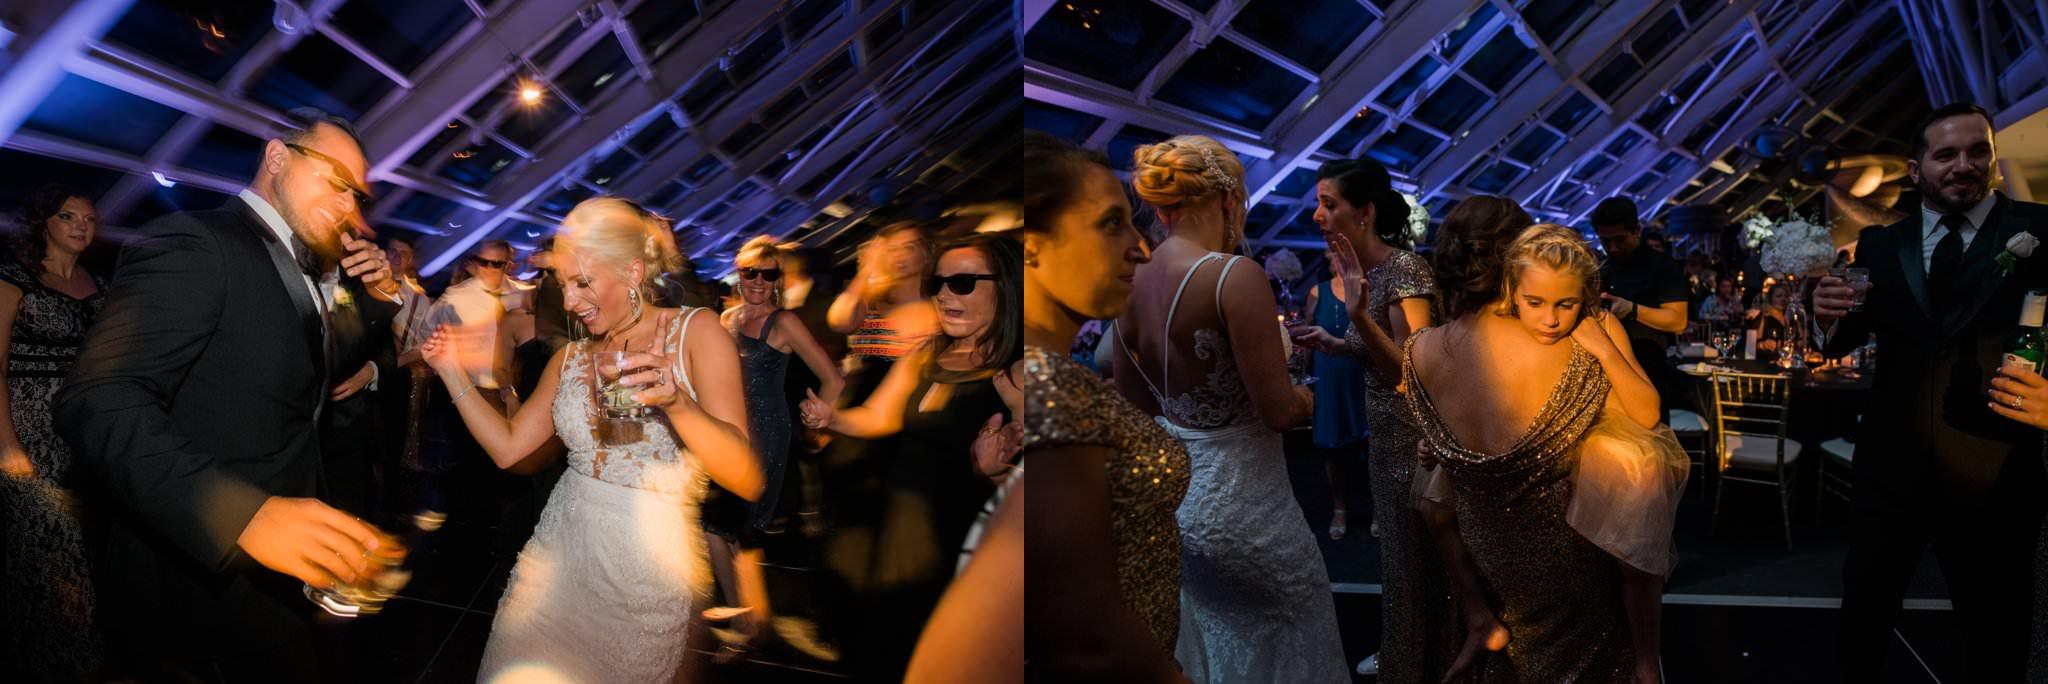 Adler-Planetarium-Chicago-Wedding-Photography-0118.JPG